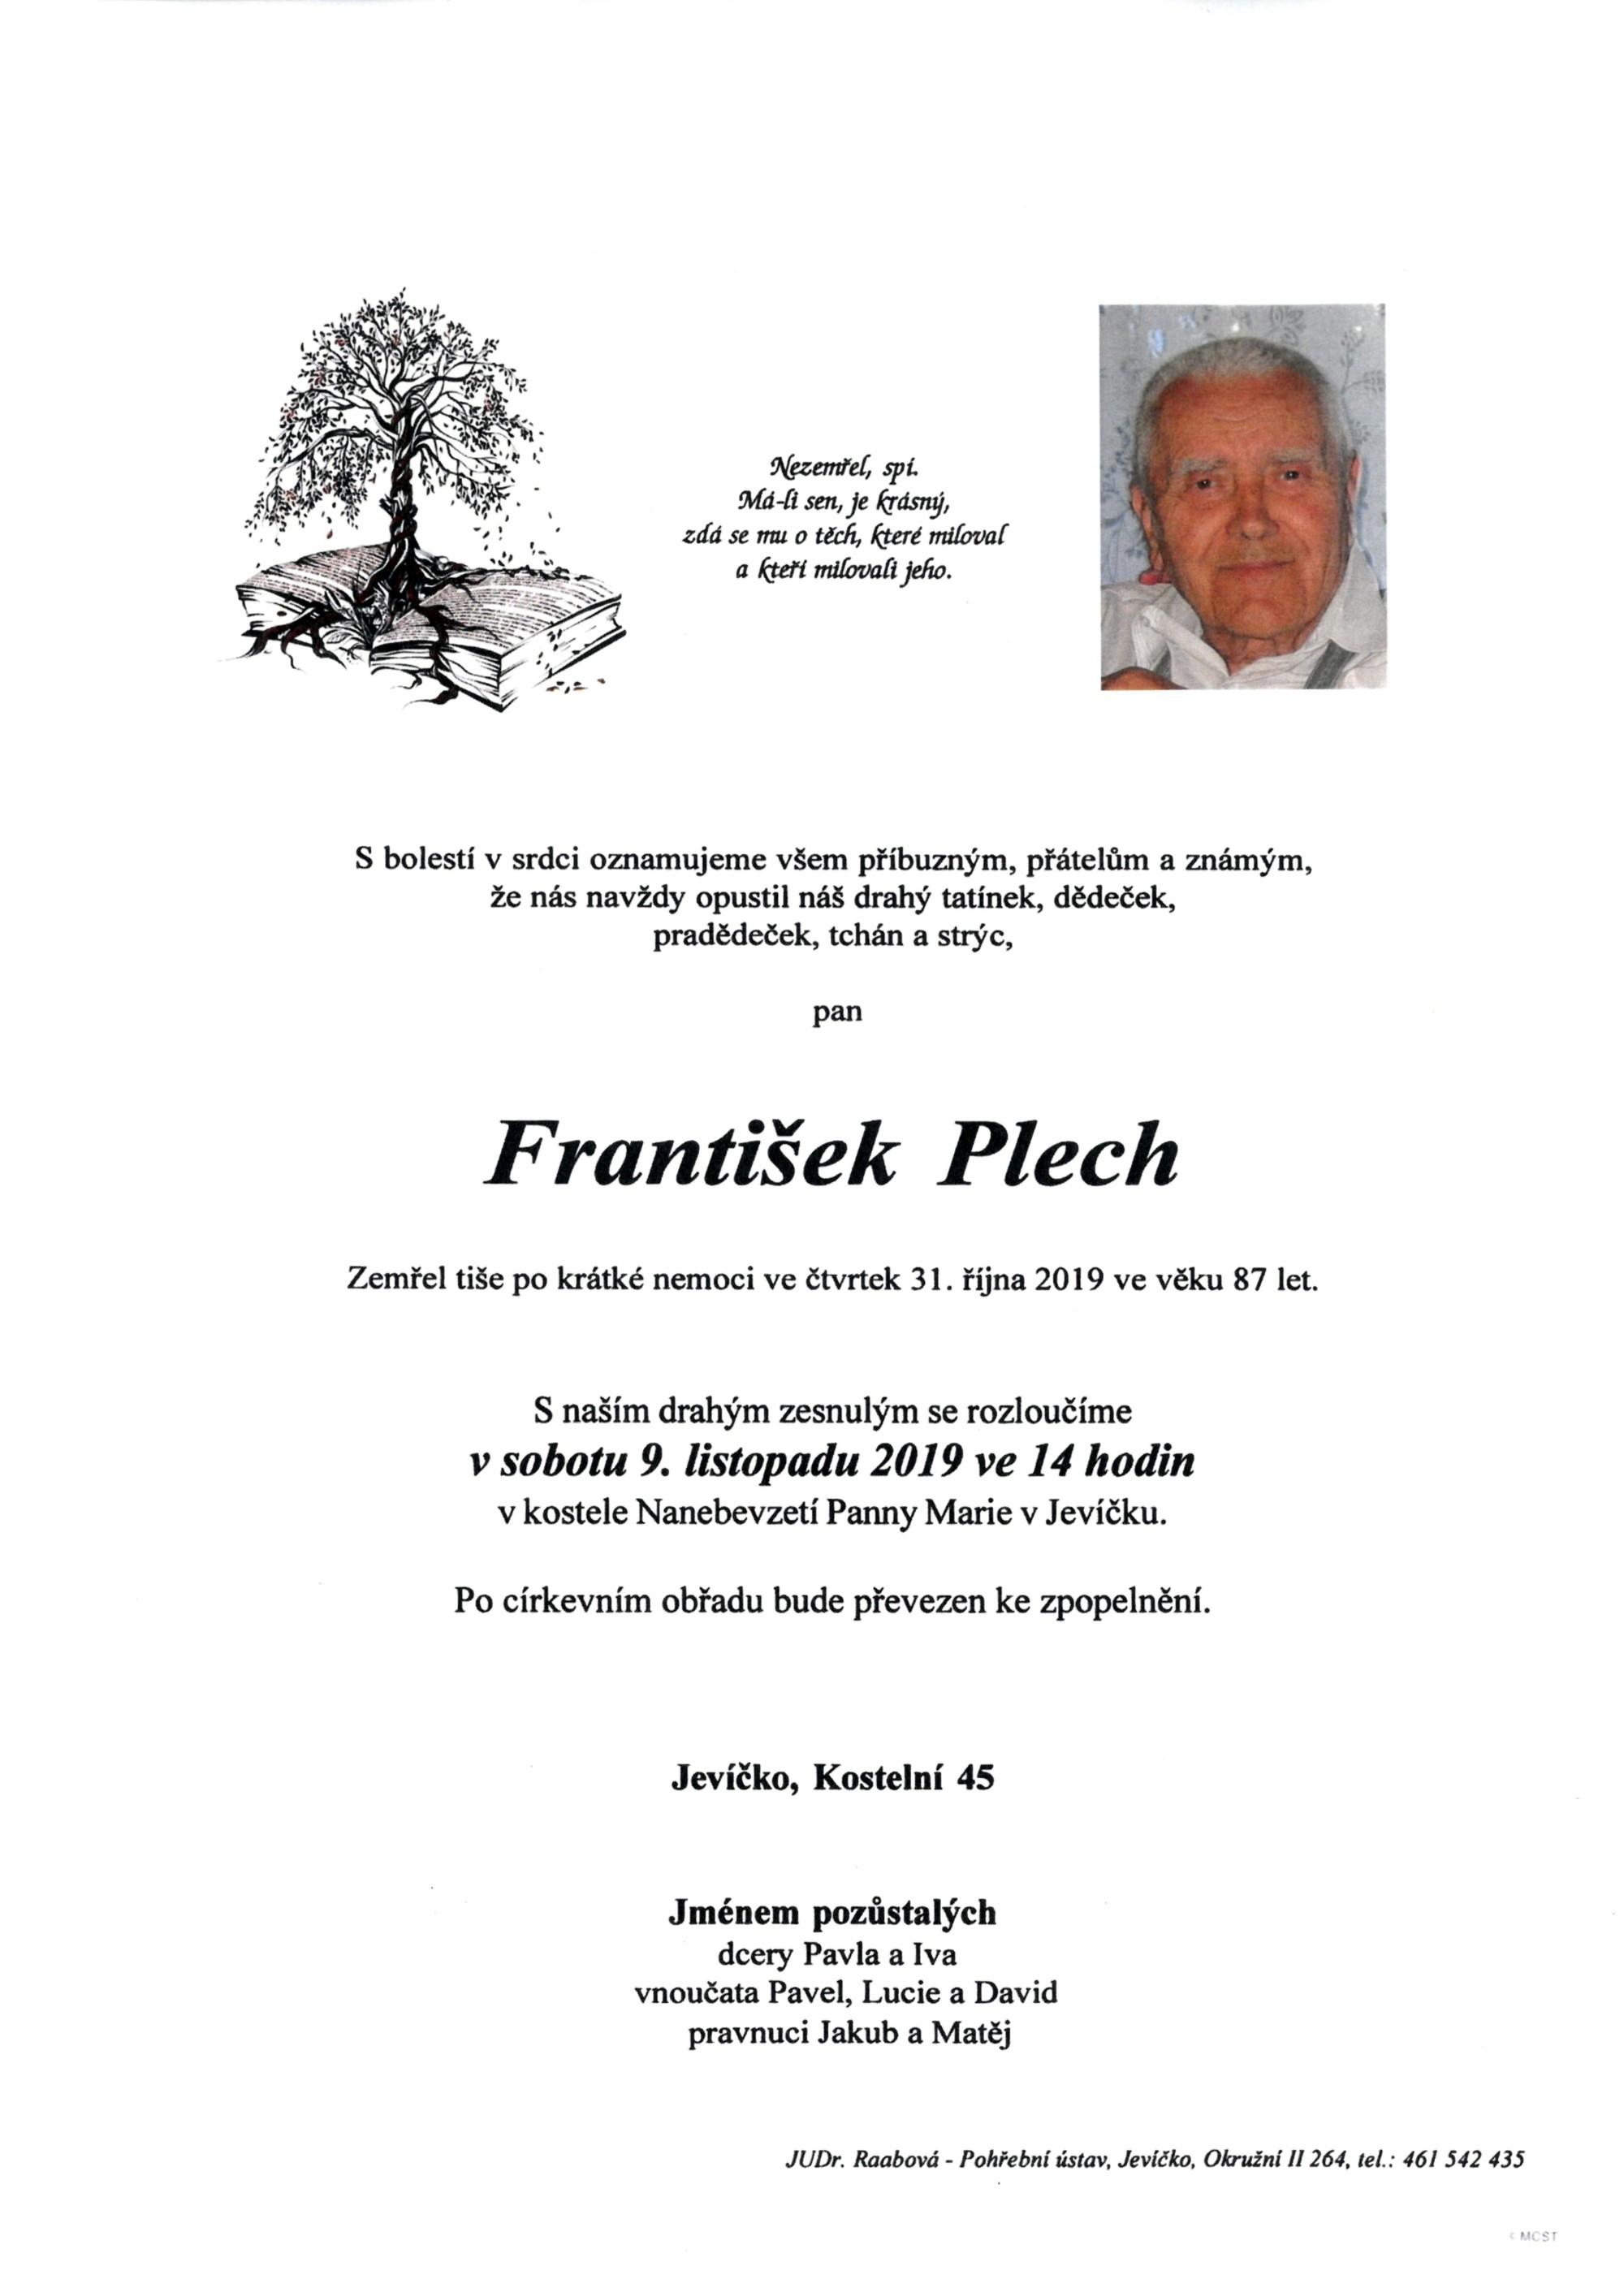 František Plech